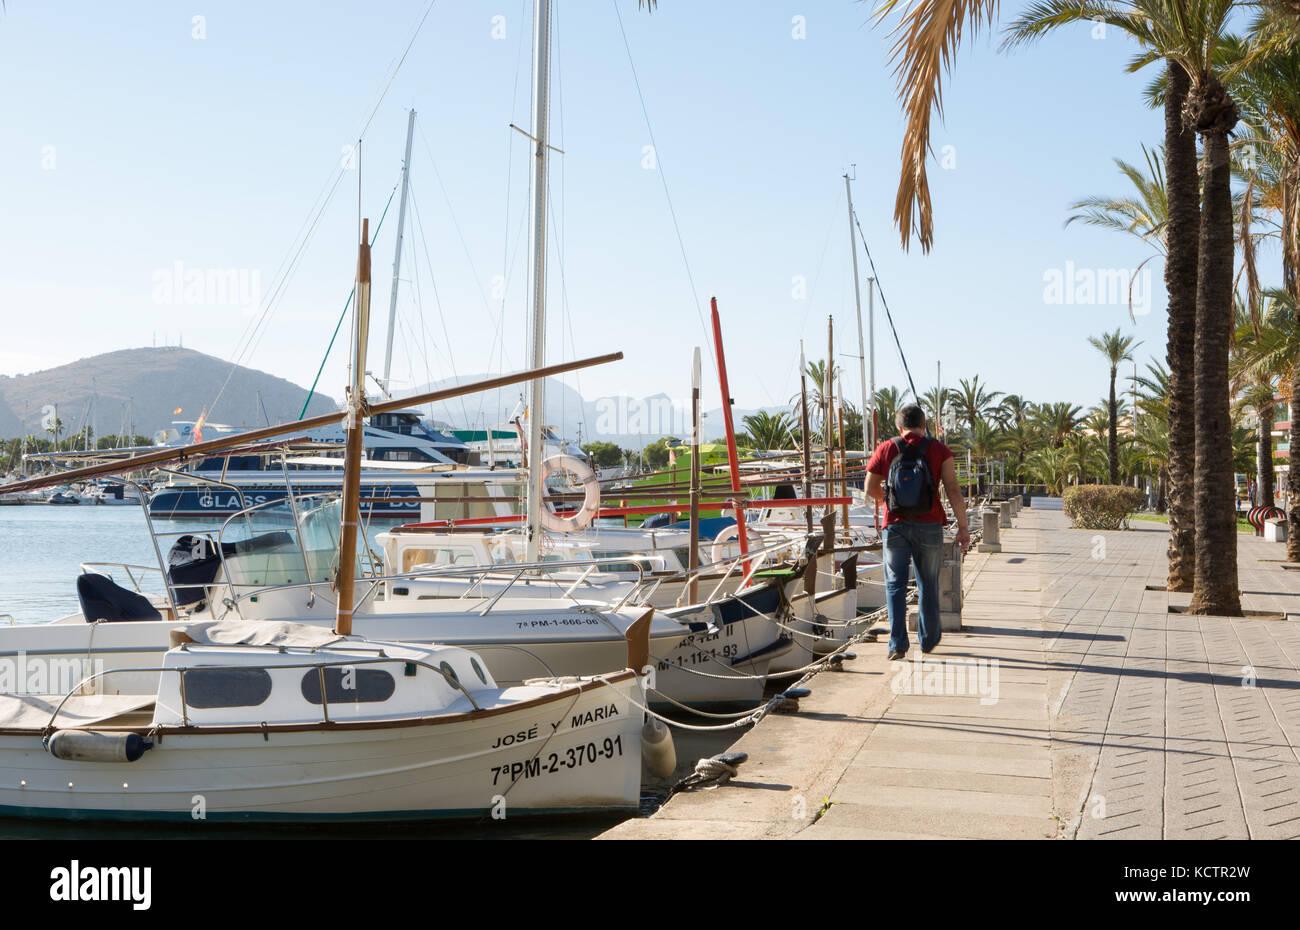 Man walking at harbour, sailing boats tied to mooring post, Puerto de Alcudia, Alcudia, Majorca, Balearic Islands, - Stock Image